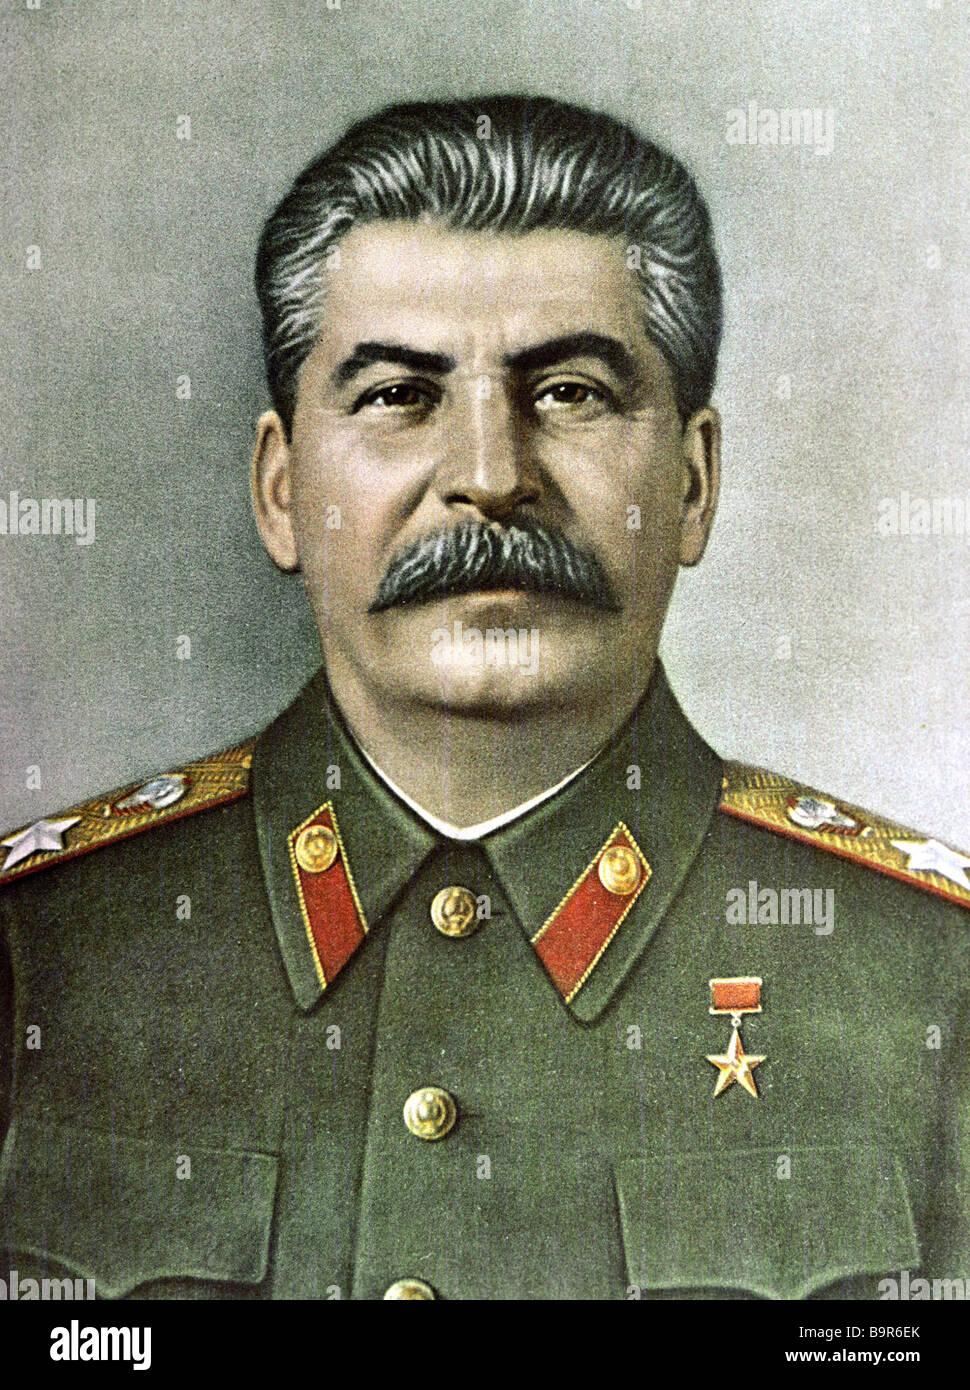 Joseph Stalin 1879 1953 - Stock Image